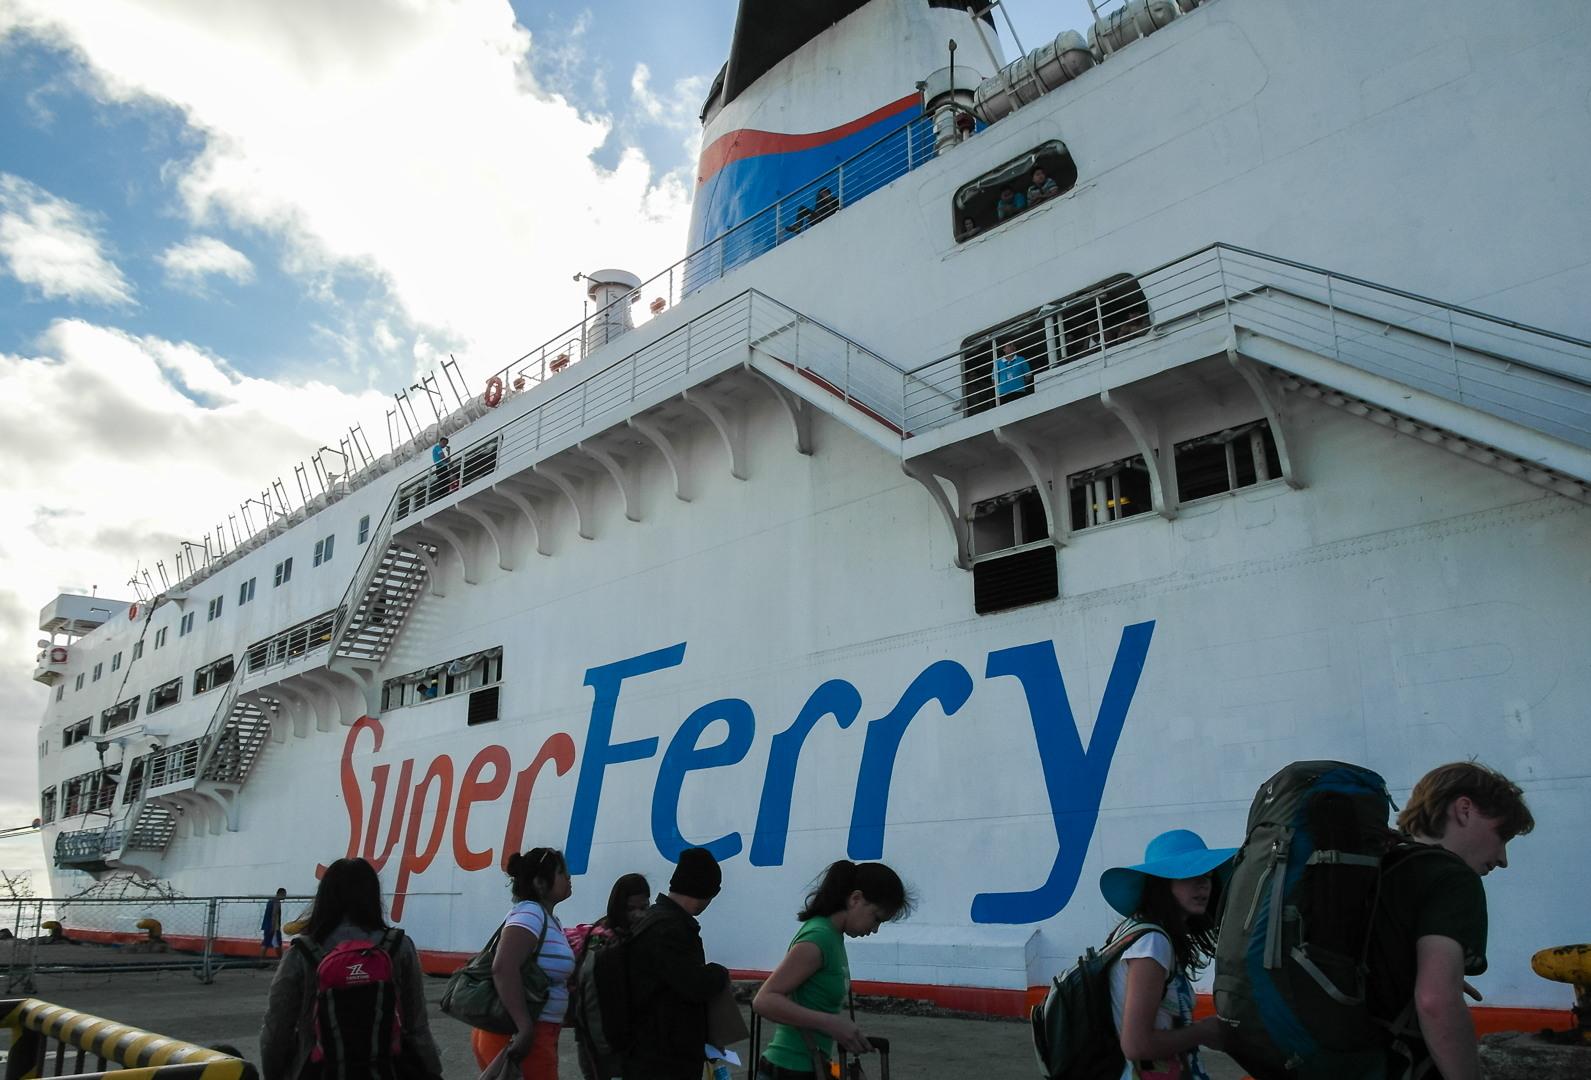 Ship Super Ferry, Philippines